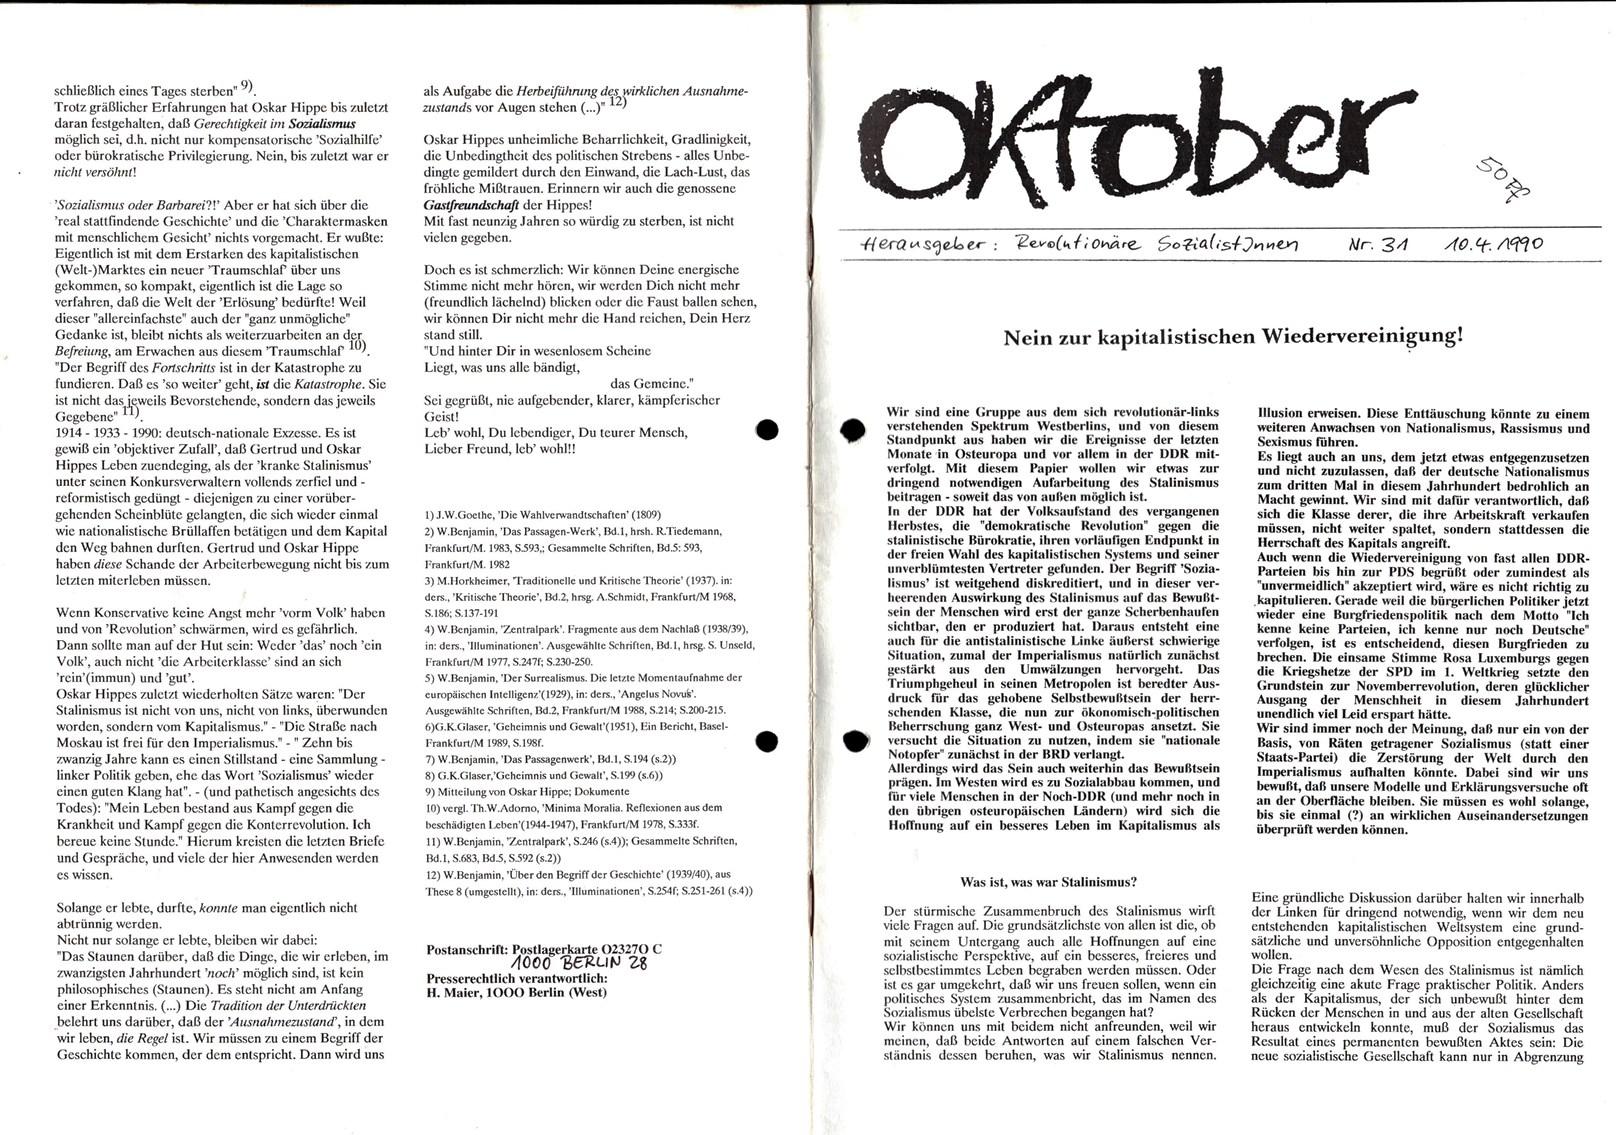 BER_IKW_Oktober_19900410_031_001